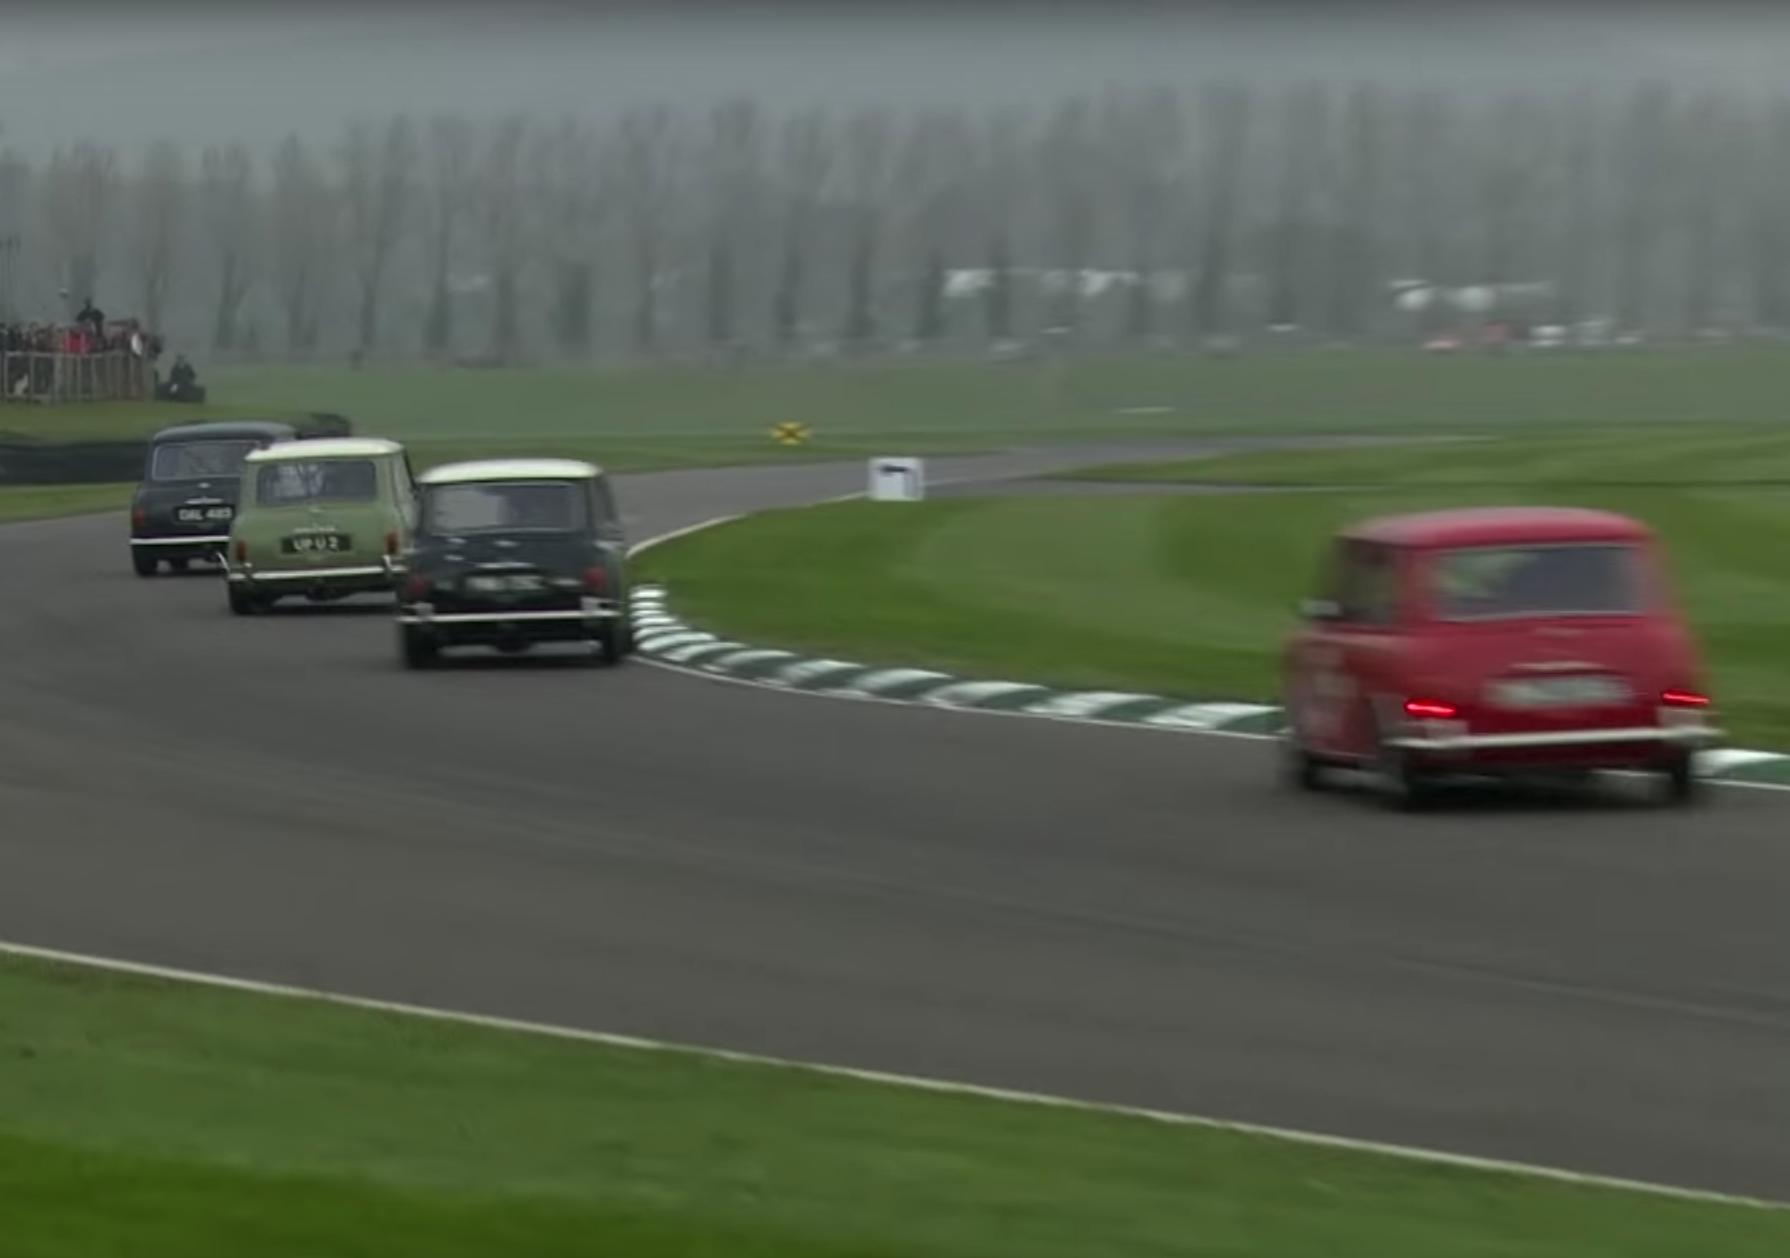 classic mini race at goodwood member's meeting